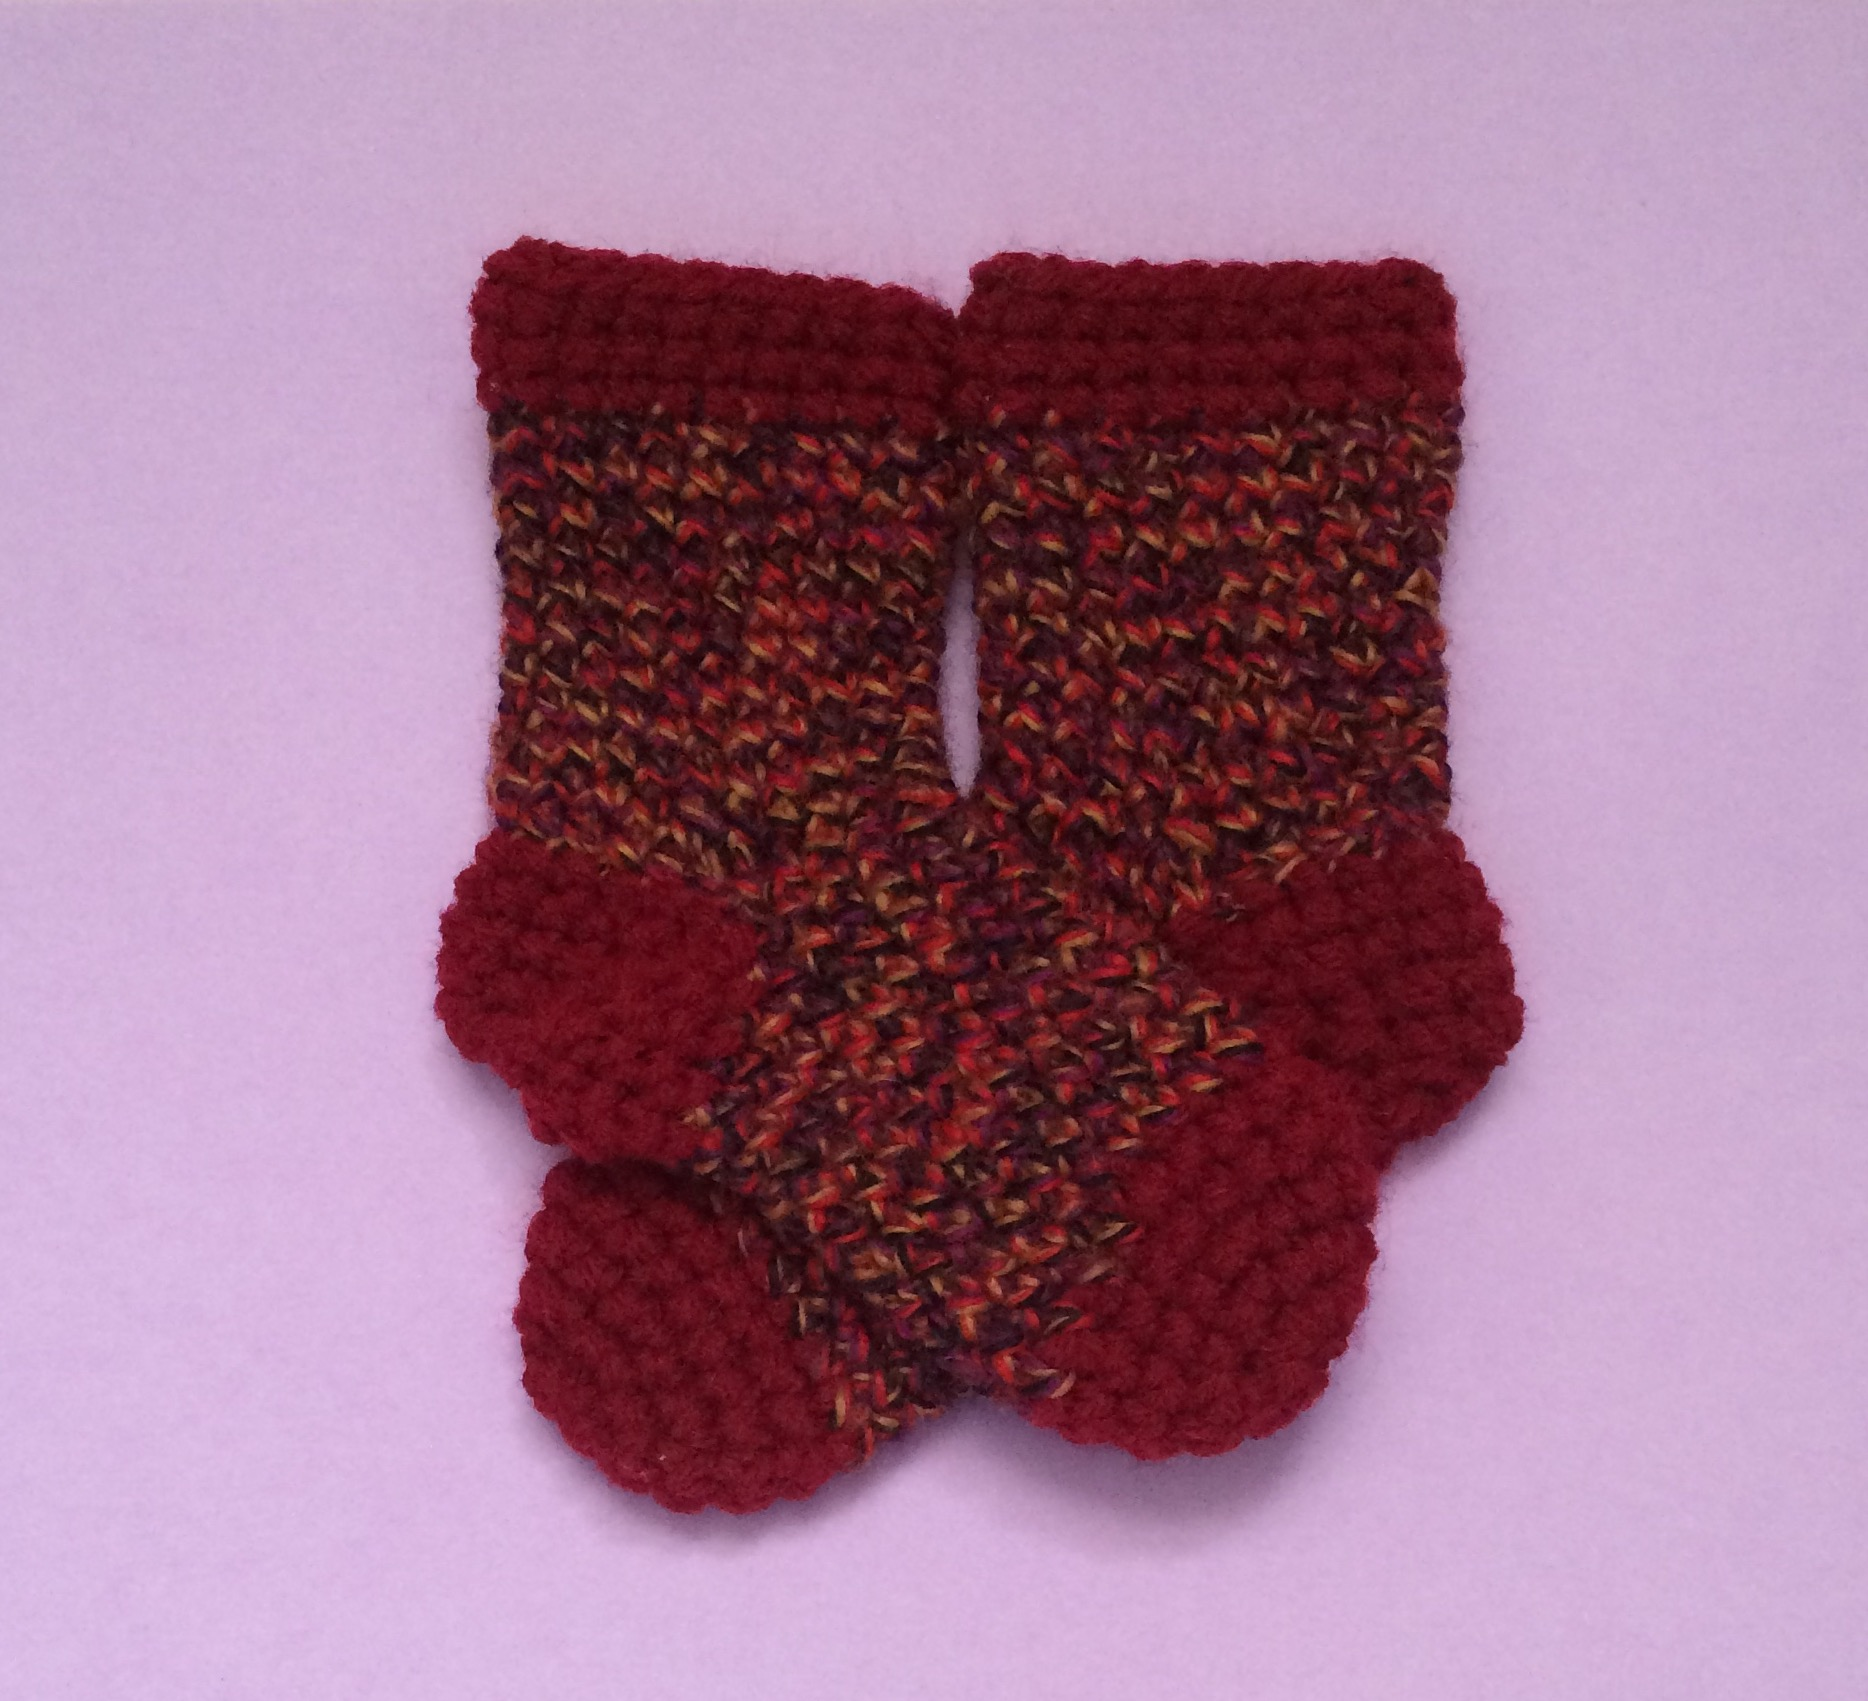 Crochet Baby Socks Pattern 0 6 Months 4 12 Inches 1143 Cm